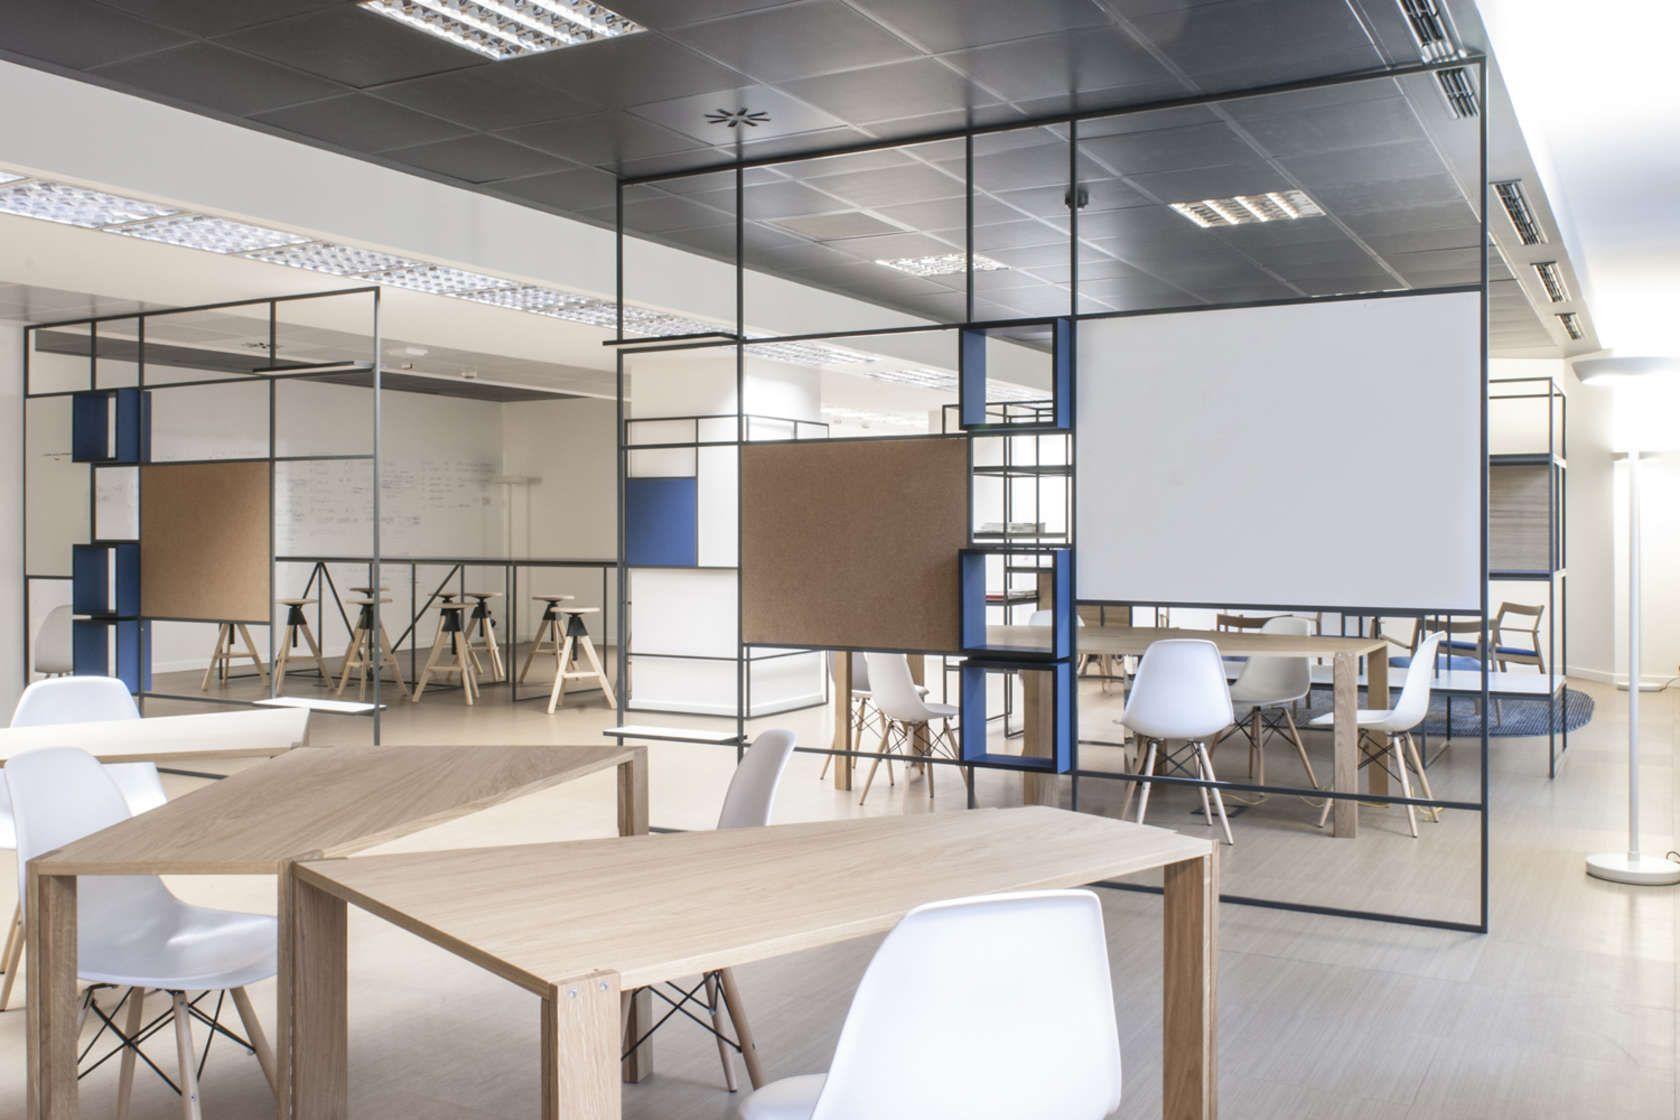 Digital Entity Workspace Office Interior Design Office Space Design Modern Office Design